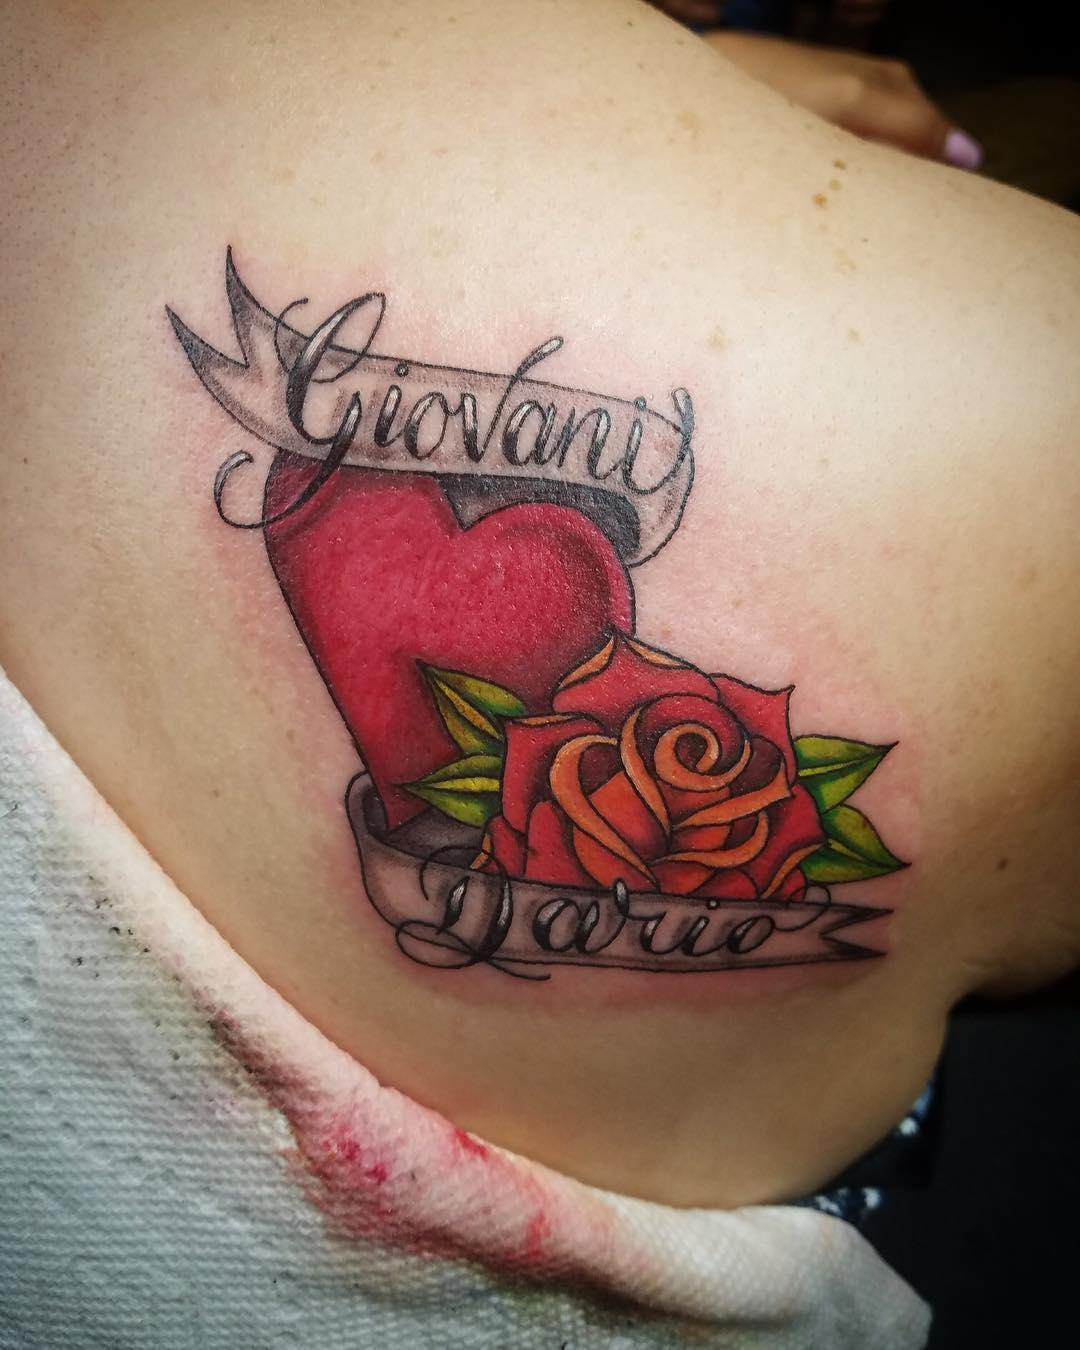 Serce W Dloniach Tatuaz Q Housepl